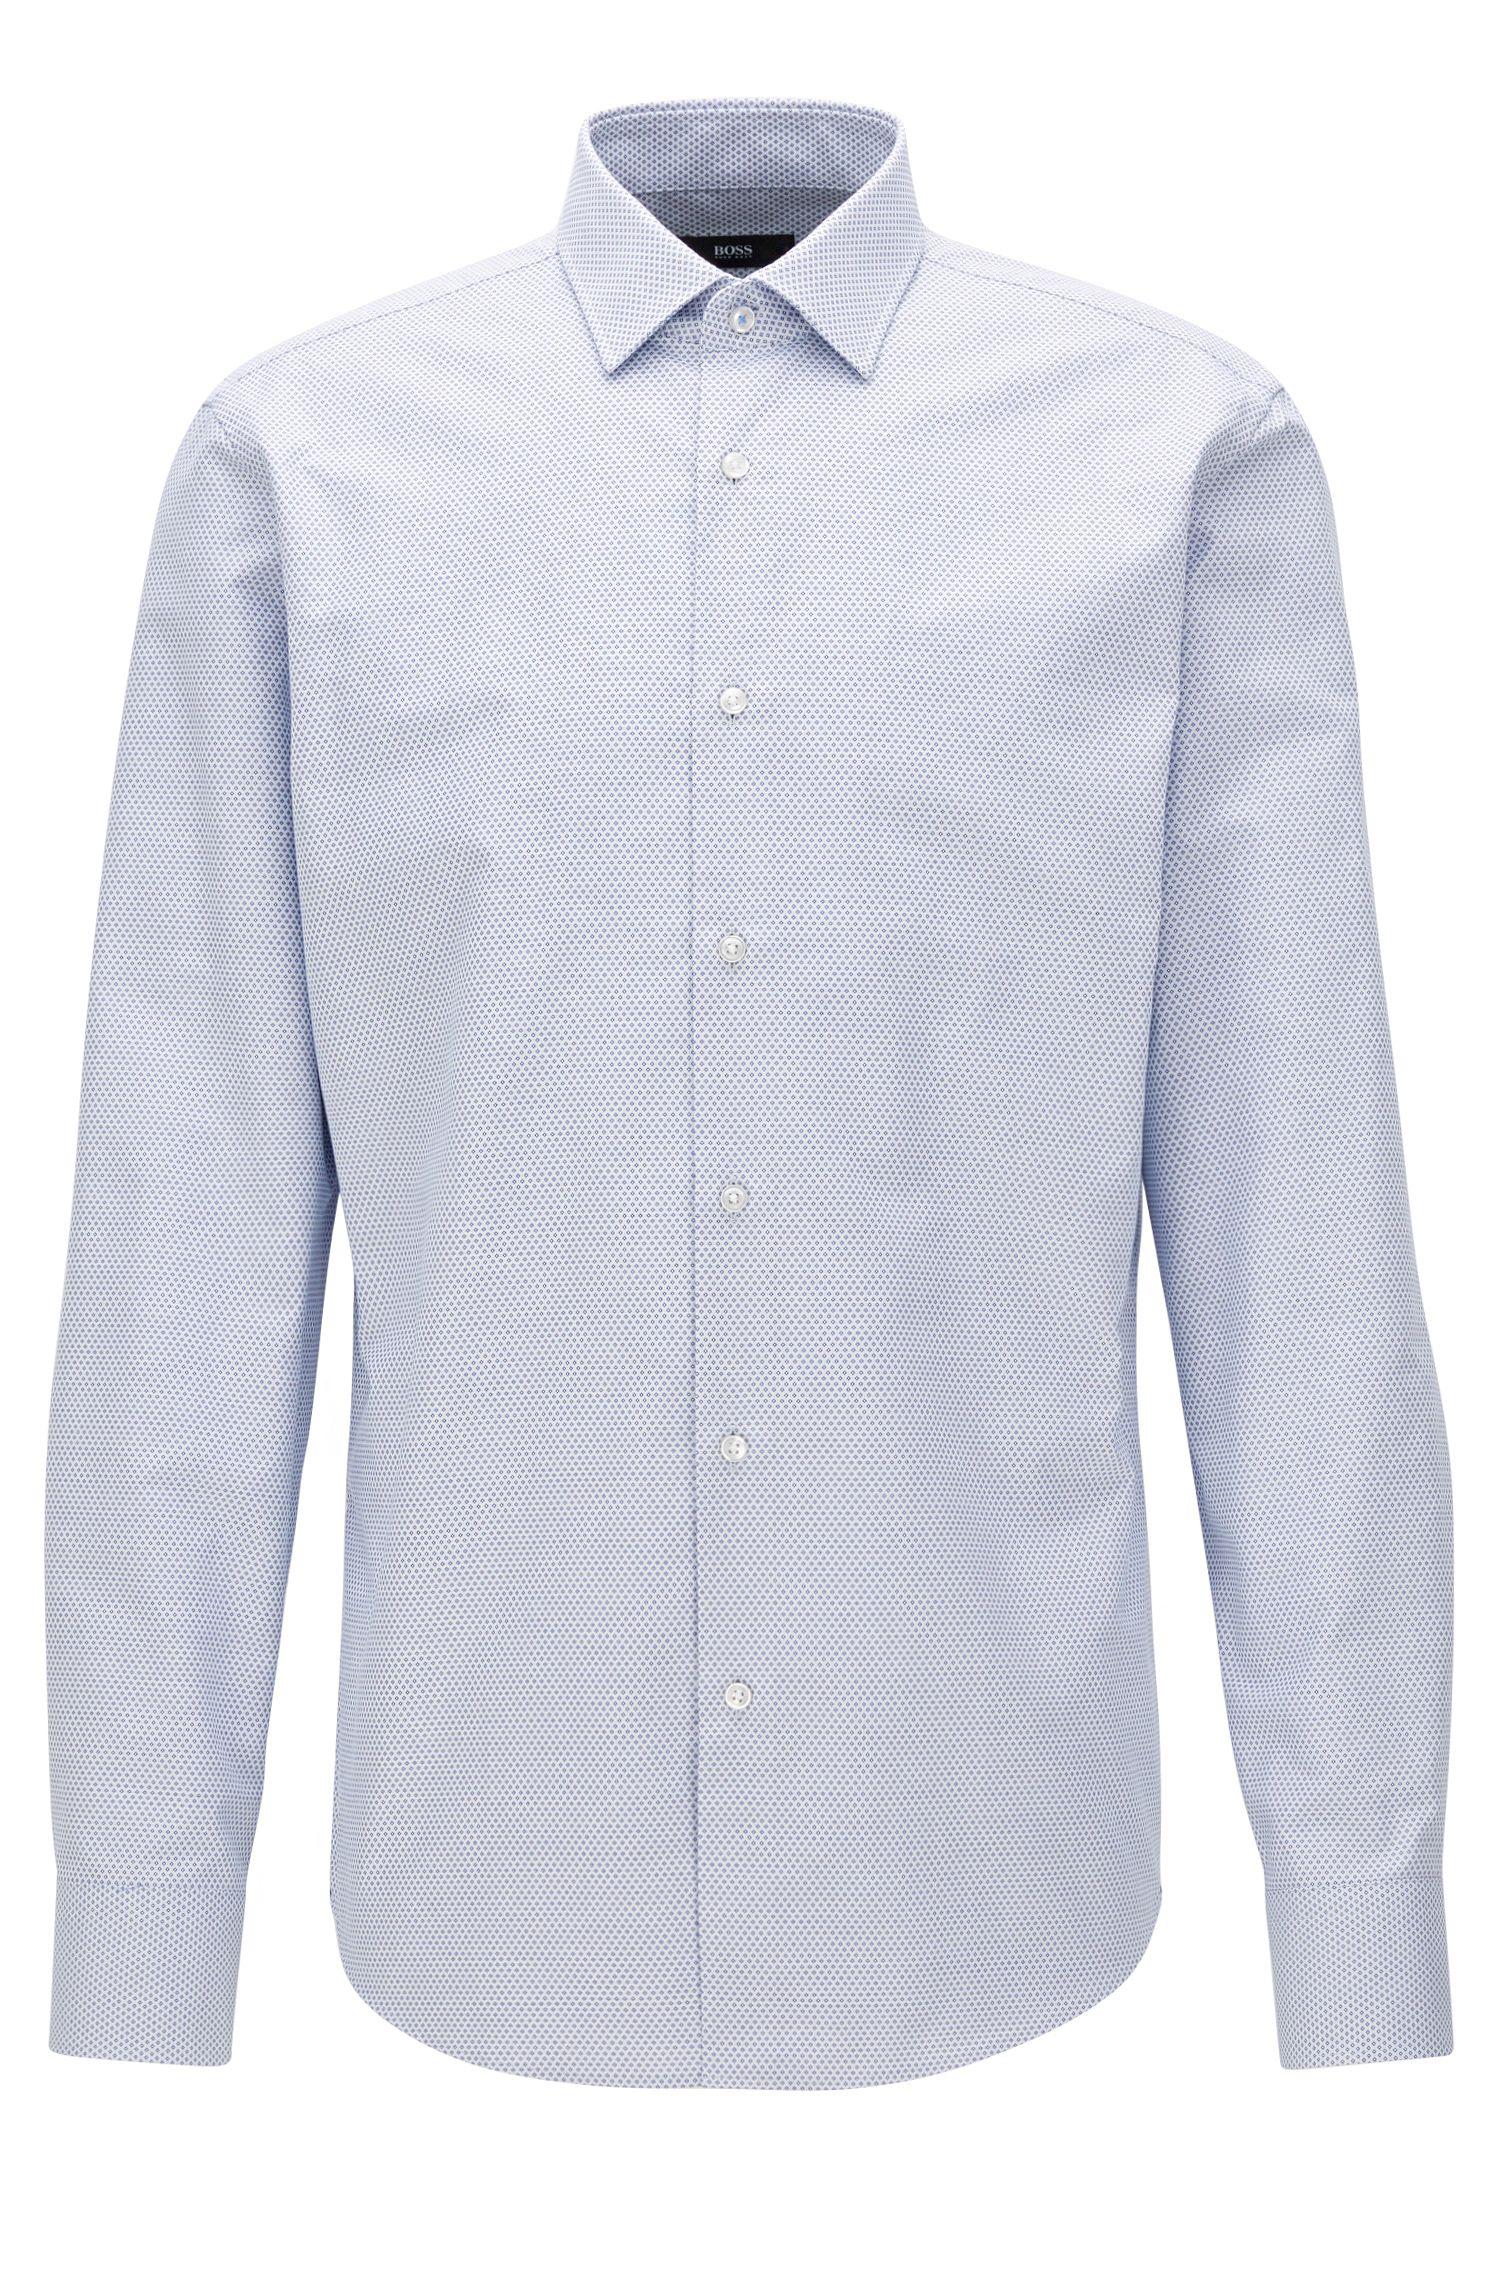 Diamond Print Cotton Dress Shirt, Regular Fit | Gerton